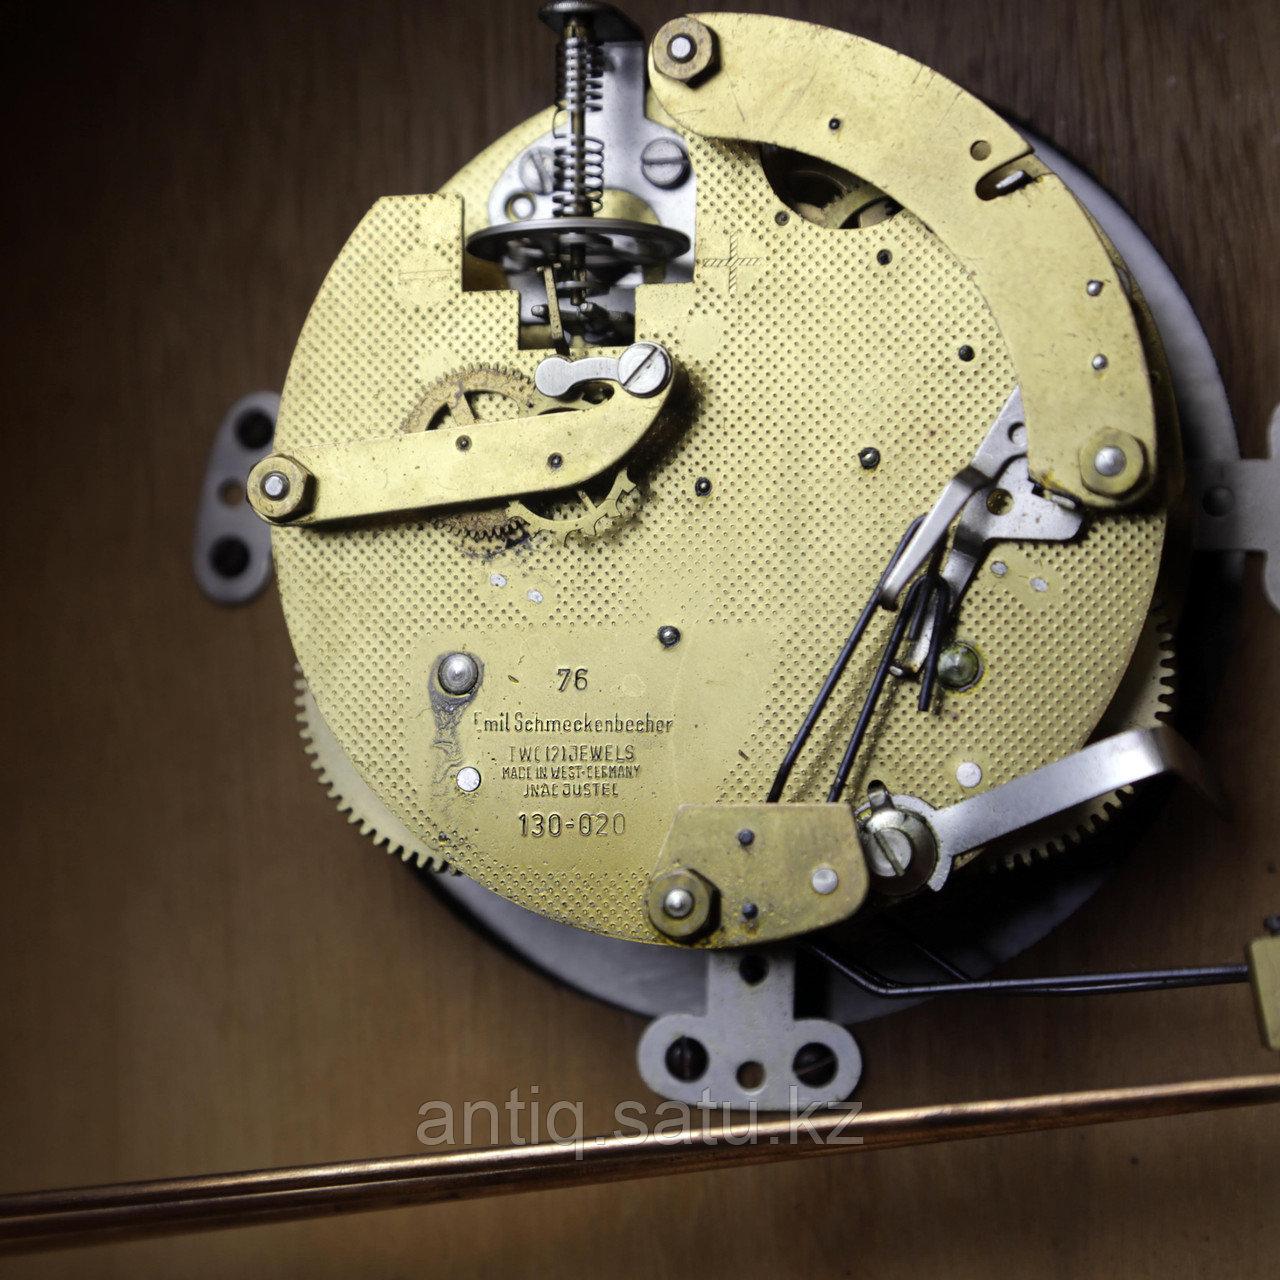 Настольные часы. Часовая мастерская Emil Schmeckenbecher - фото 8